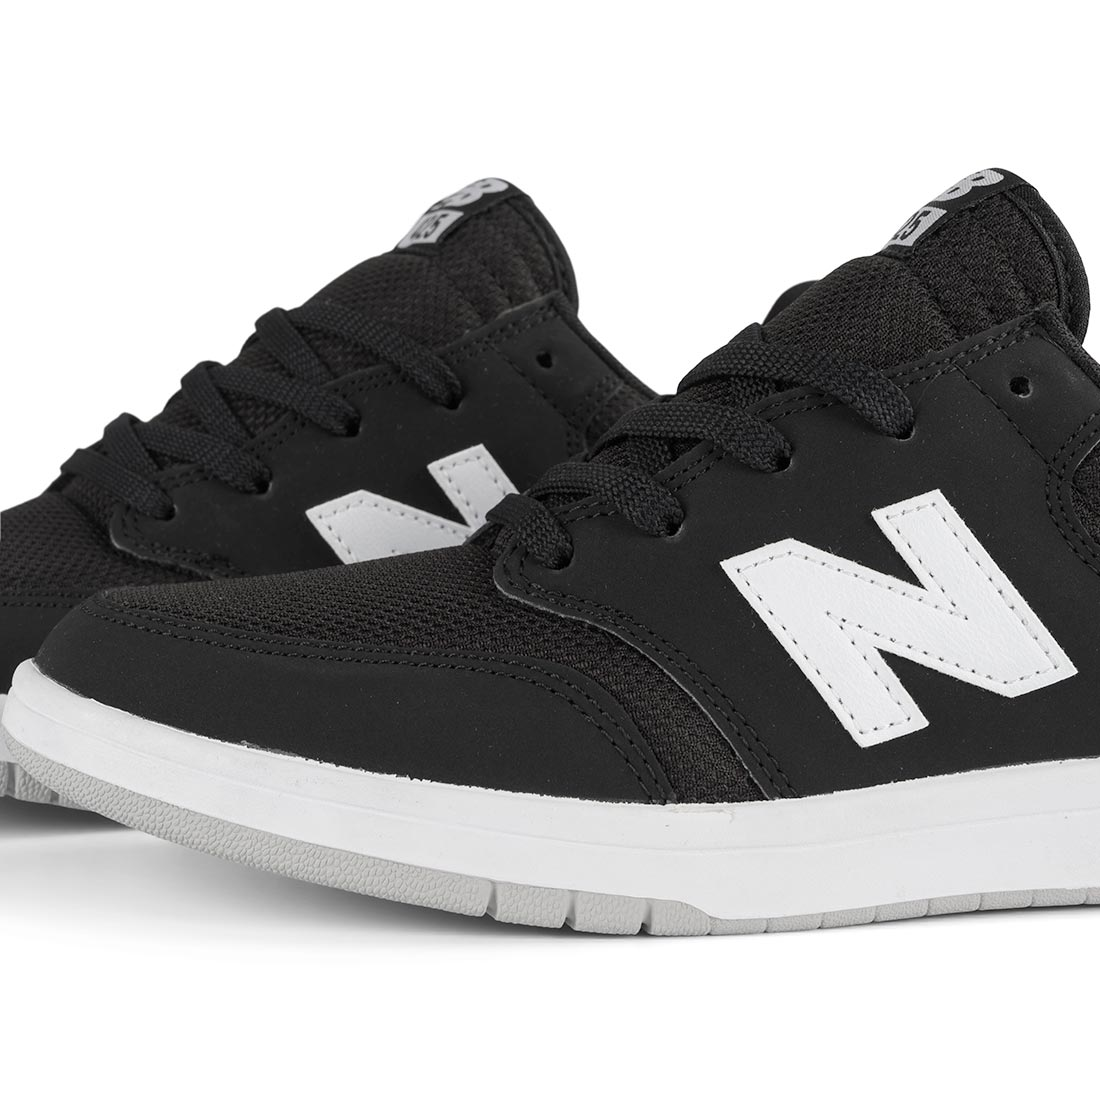 7bfb690ebefbb New Balance All Coasts 425 Shoes - Black / White